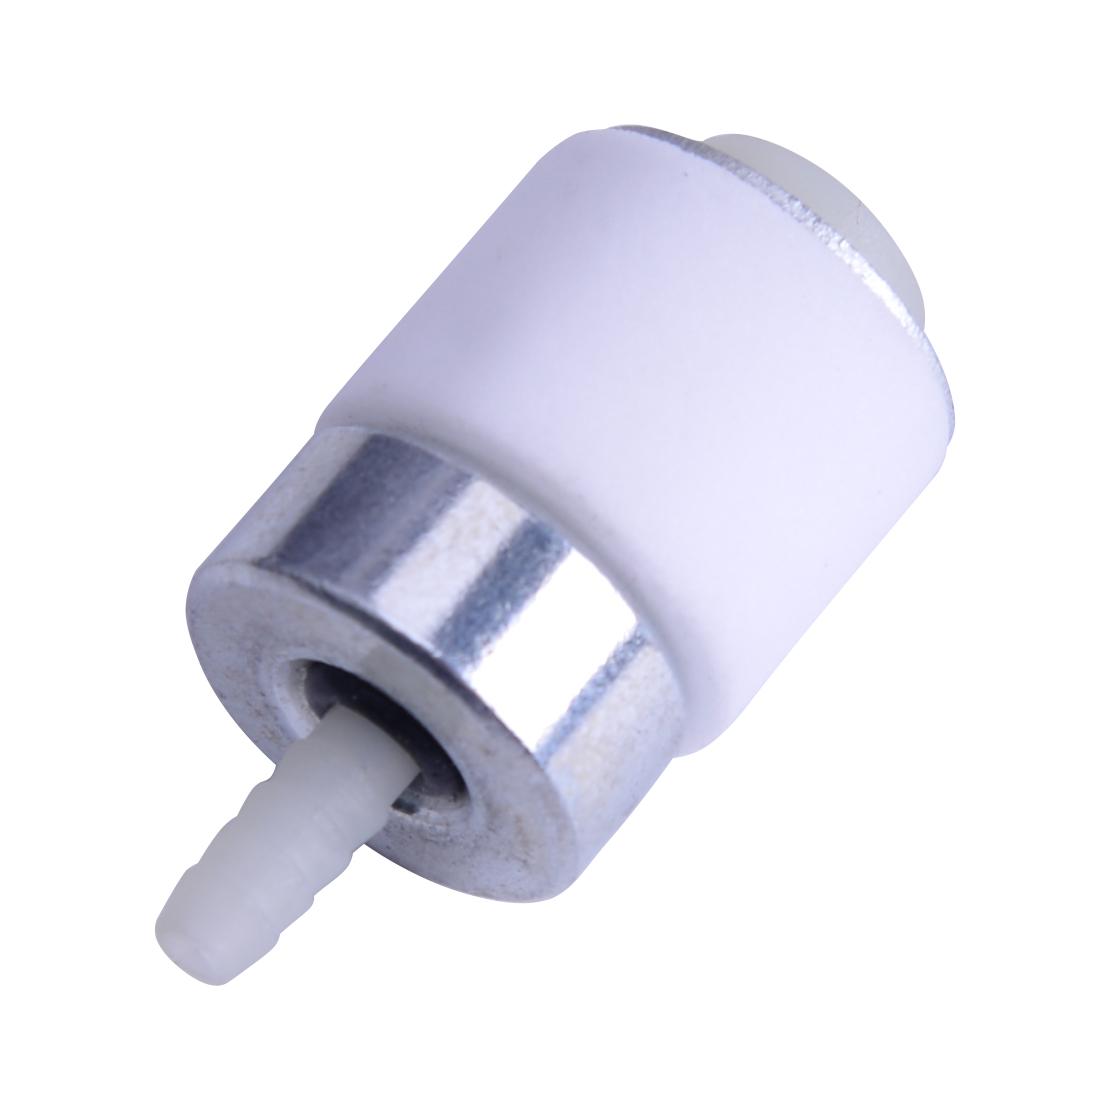 4pc Fuel Line Filter Primer Bulb for TROY BILT TB15CS TB75SS TB90BC RYOBI BOLENS